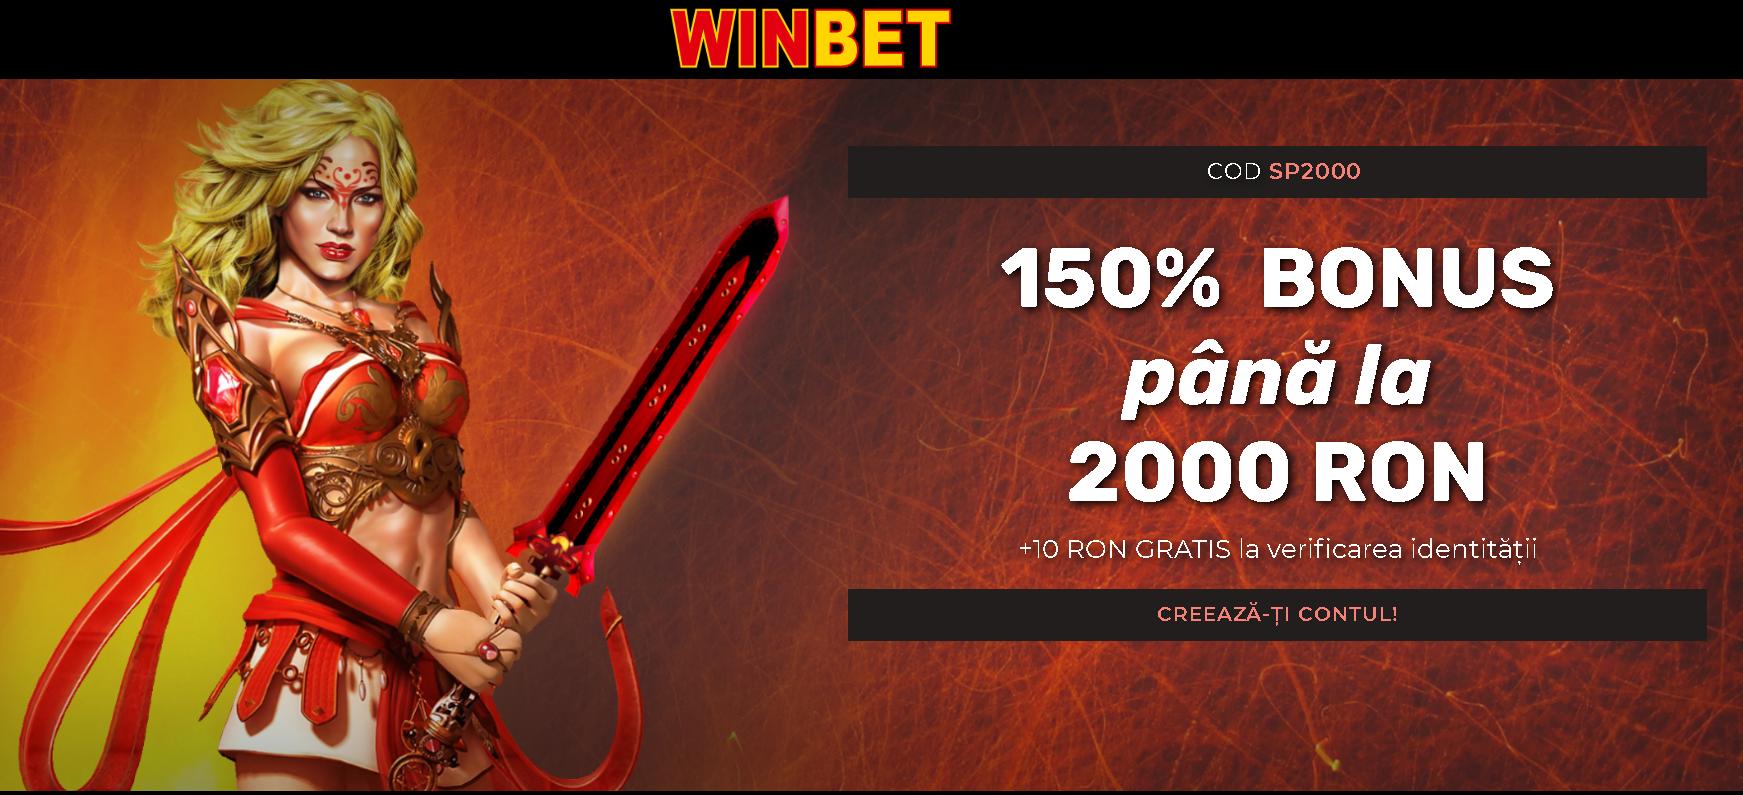 bonus winbet 150% pana al 2000 RON